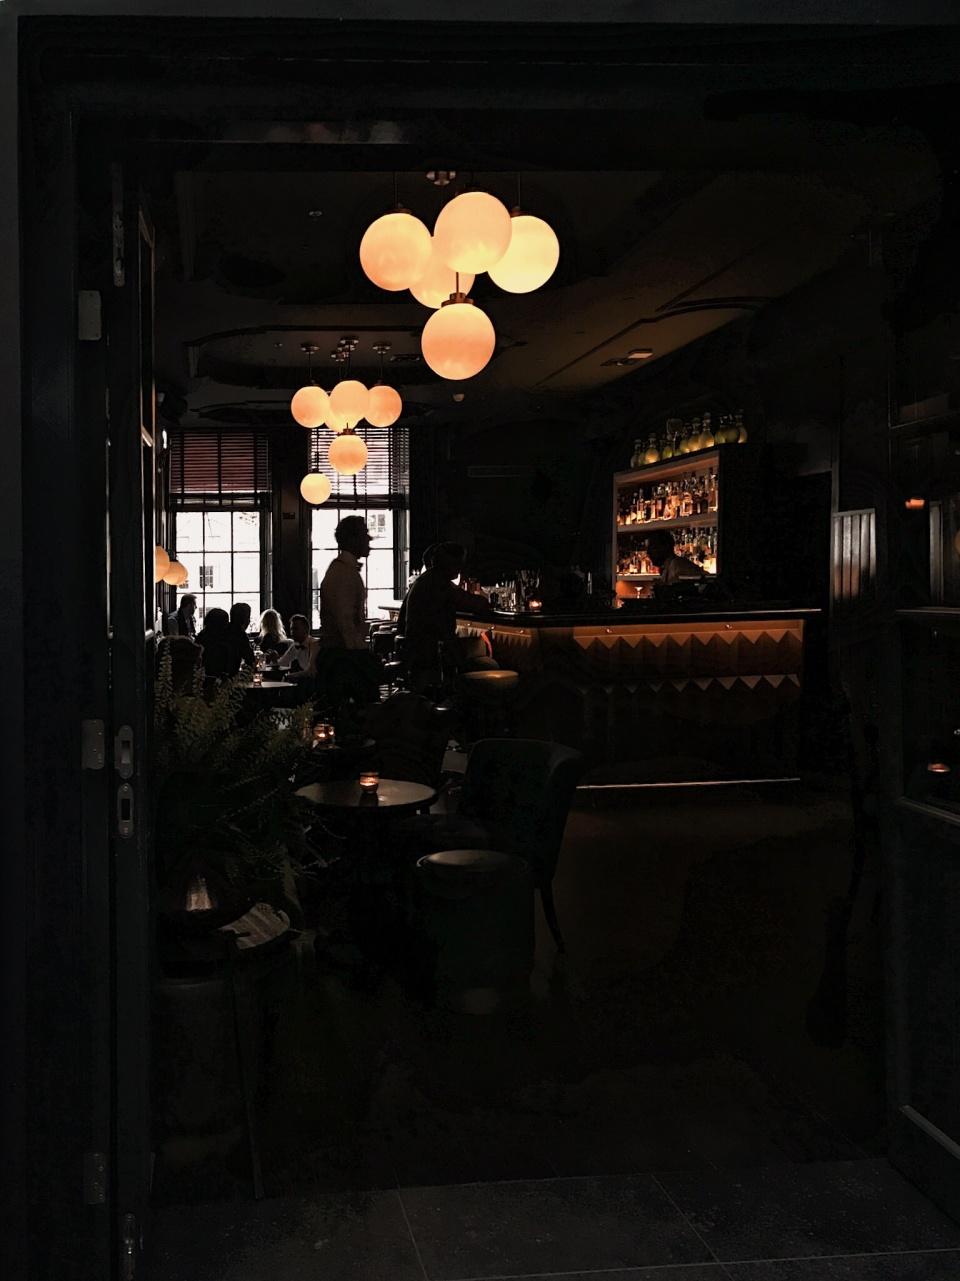 Pulitzer Hotel Bar, by twelveofour Olga Montserrat